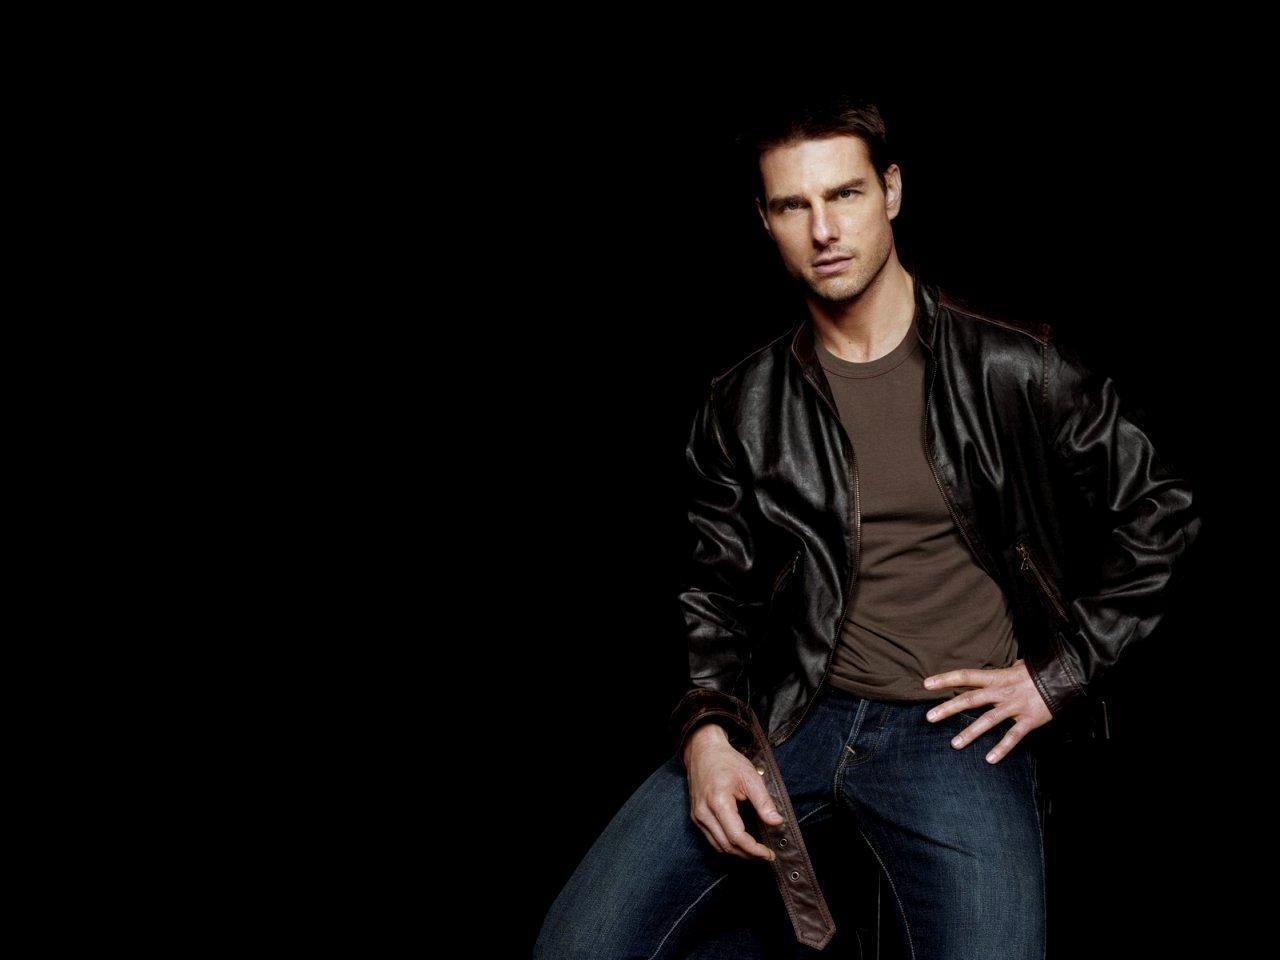 tom cruise   Tom Cruise Wallpaper 18576246 1280x960